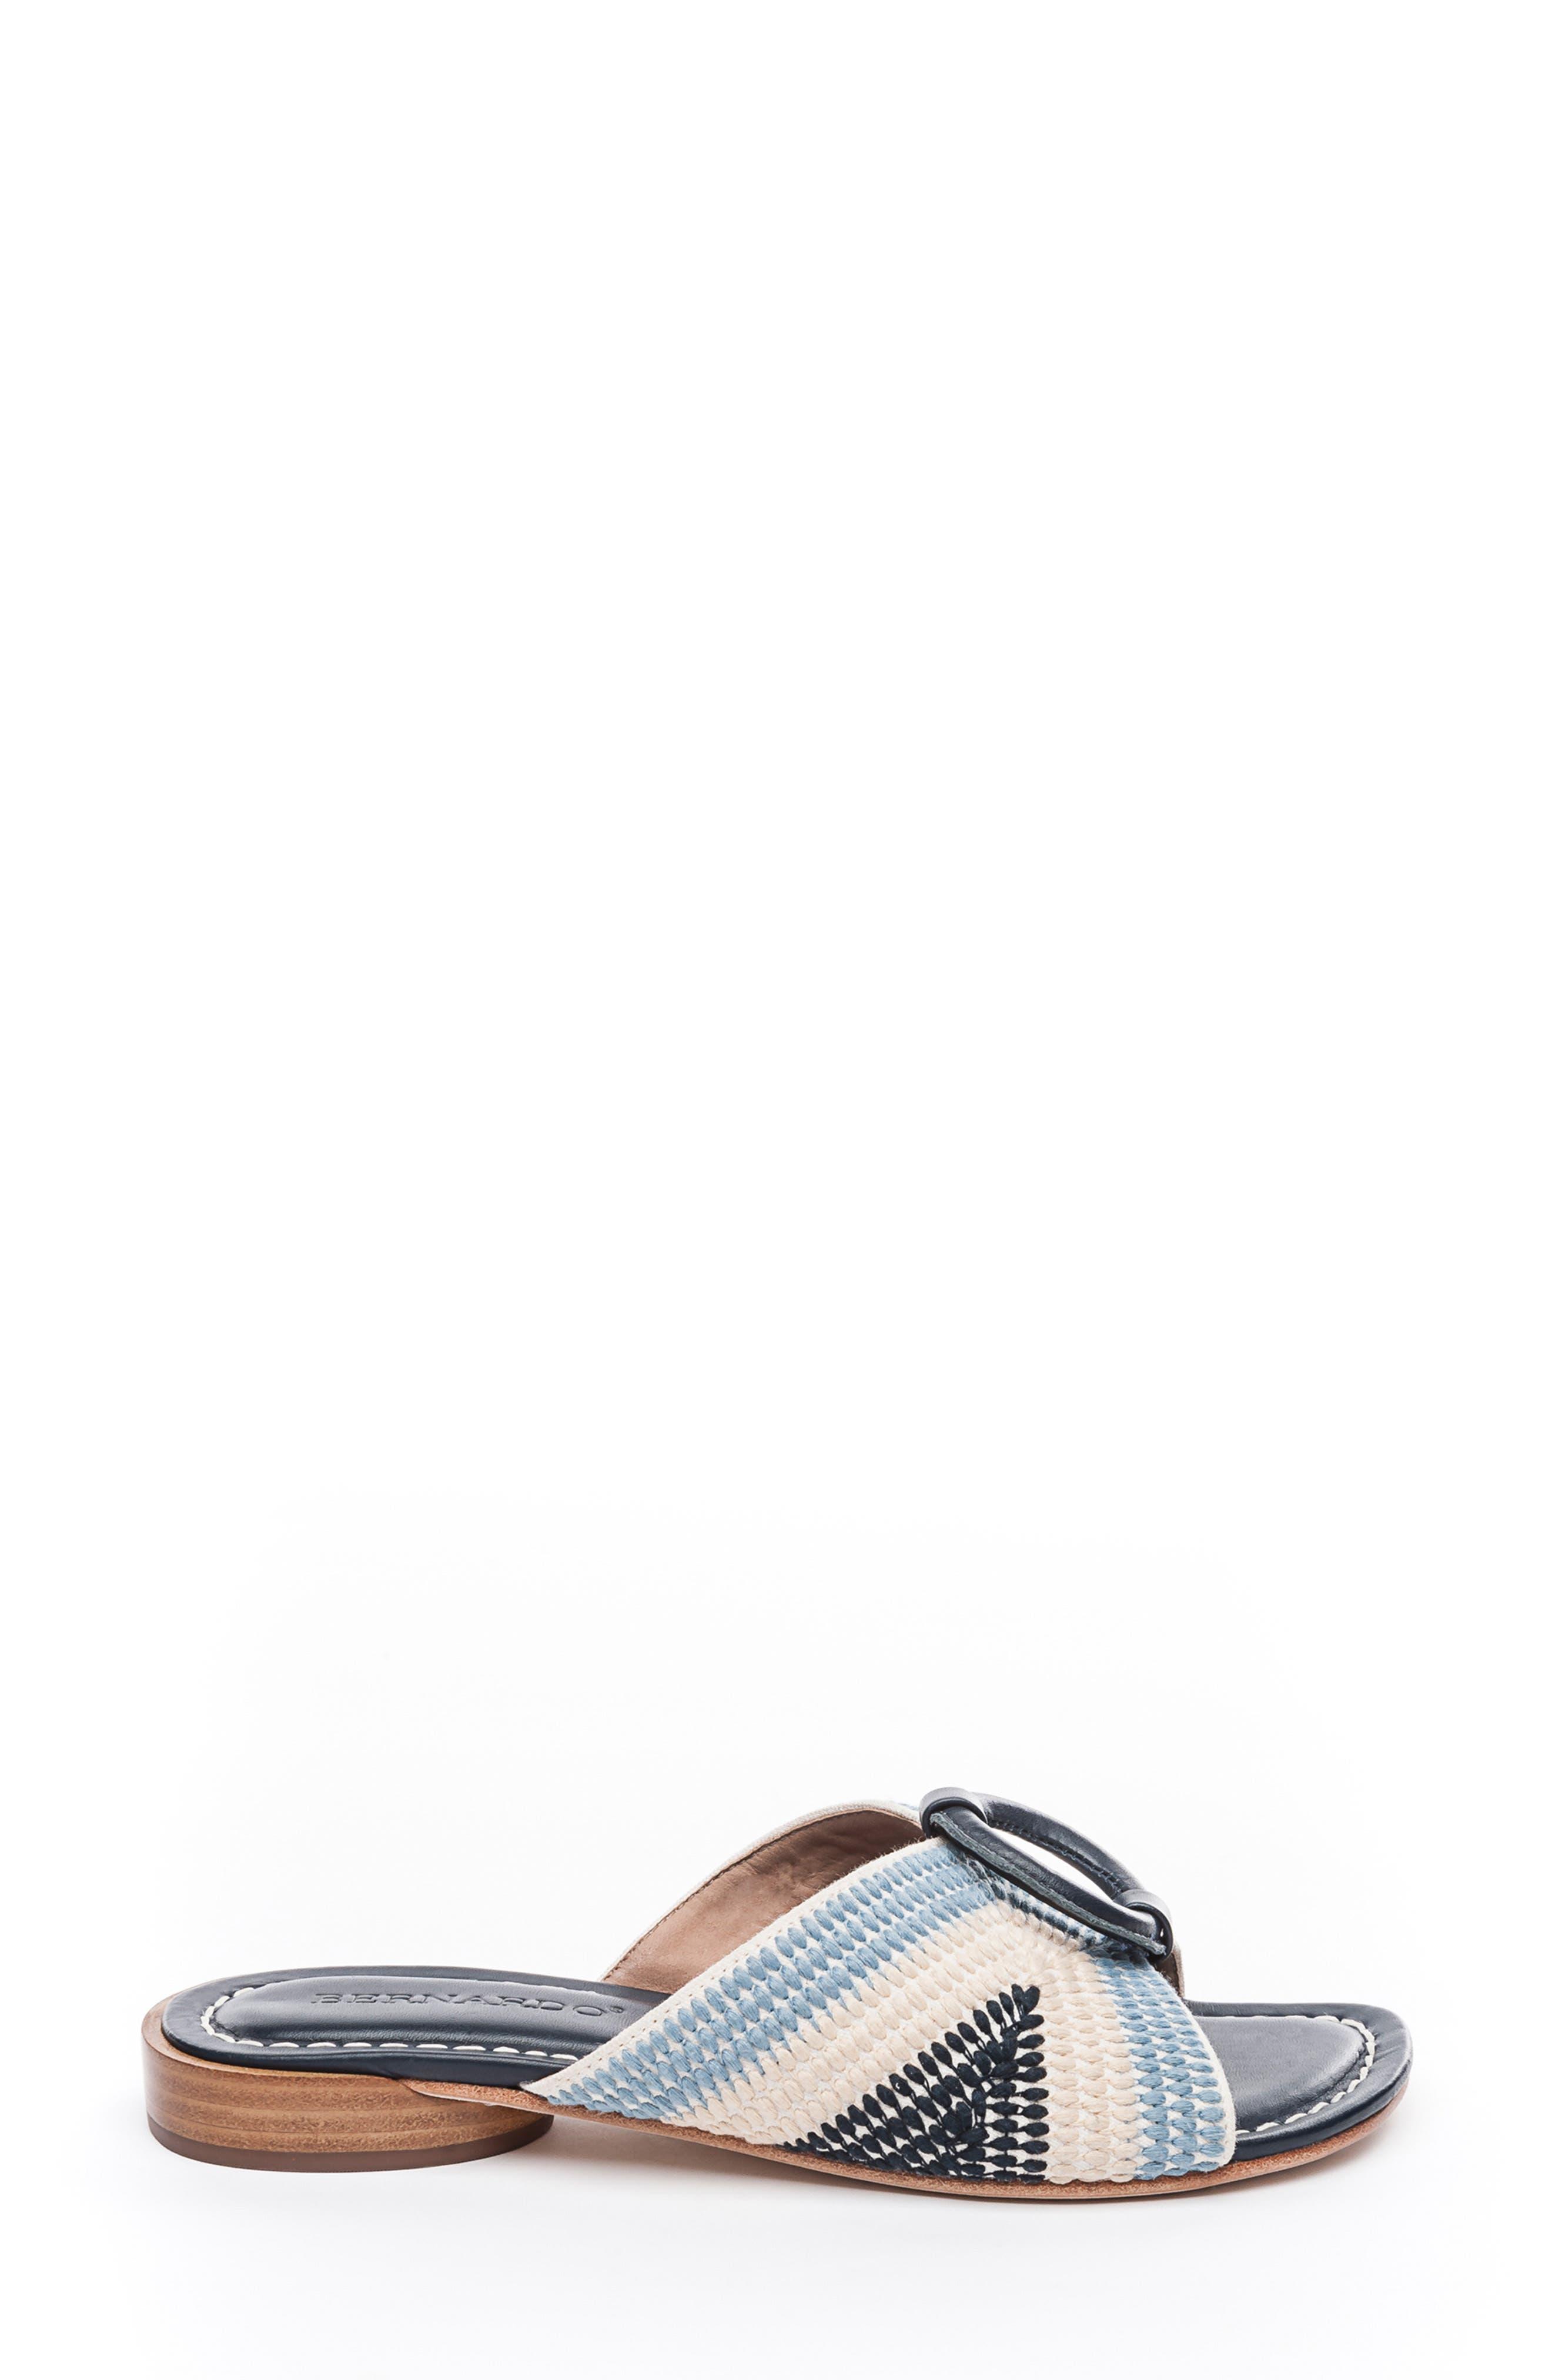 BERNARDO, Footwear Tay Slide Sandal, Alternate thumbnail 3, color, BLUE/ CREAM LEATHER